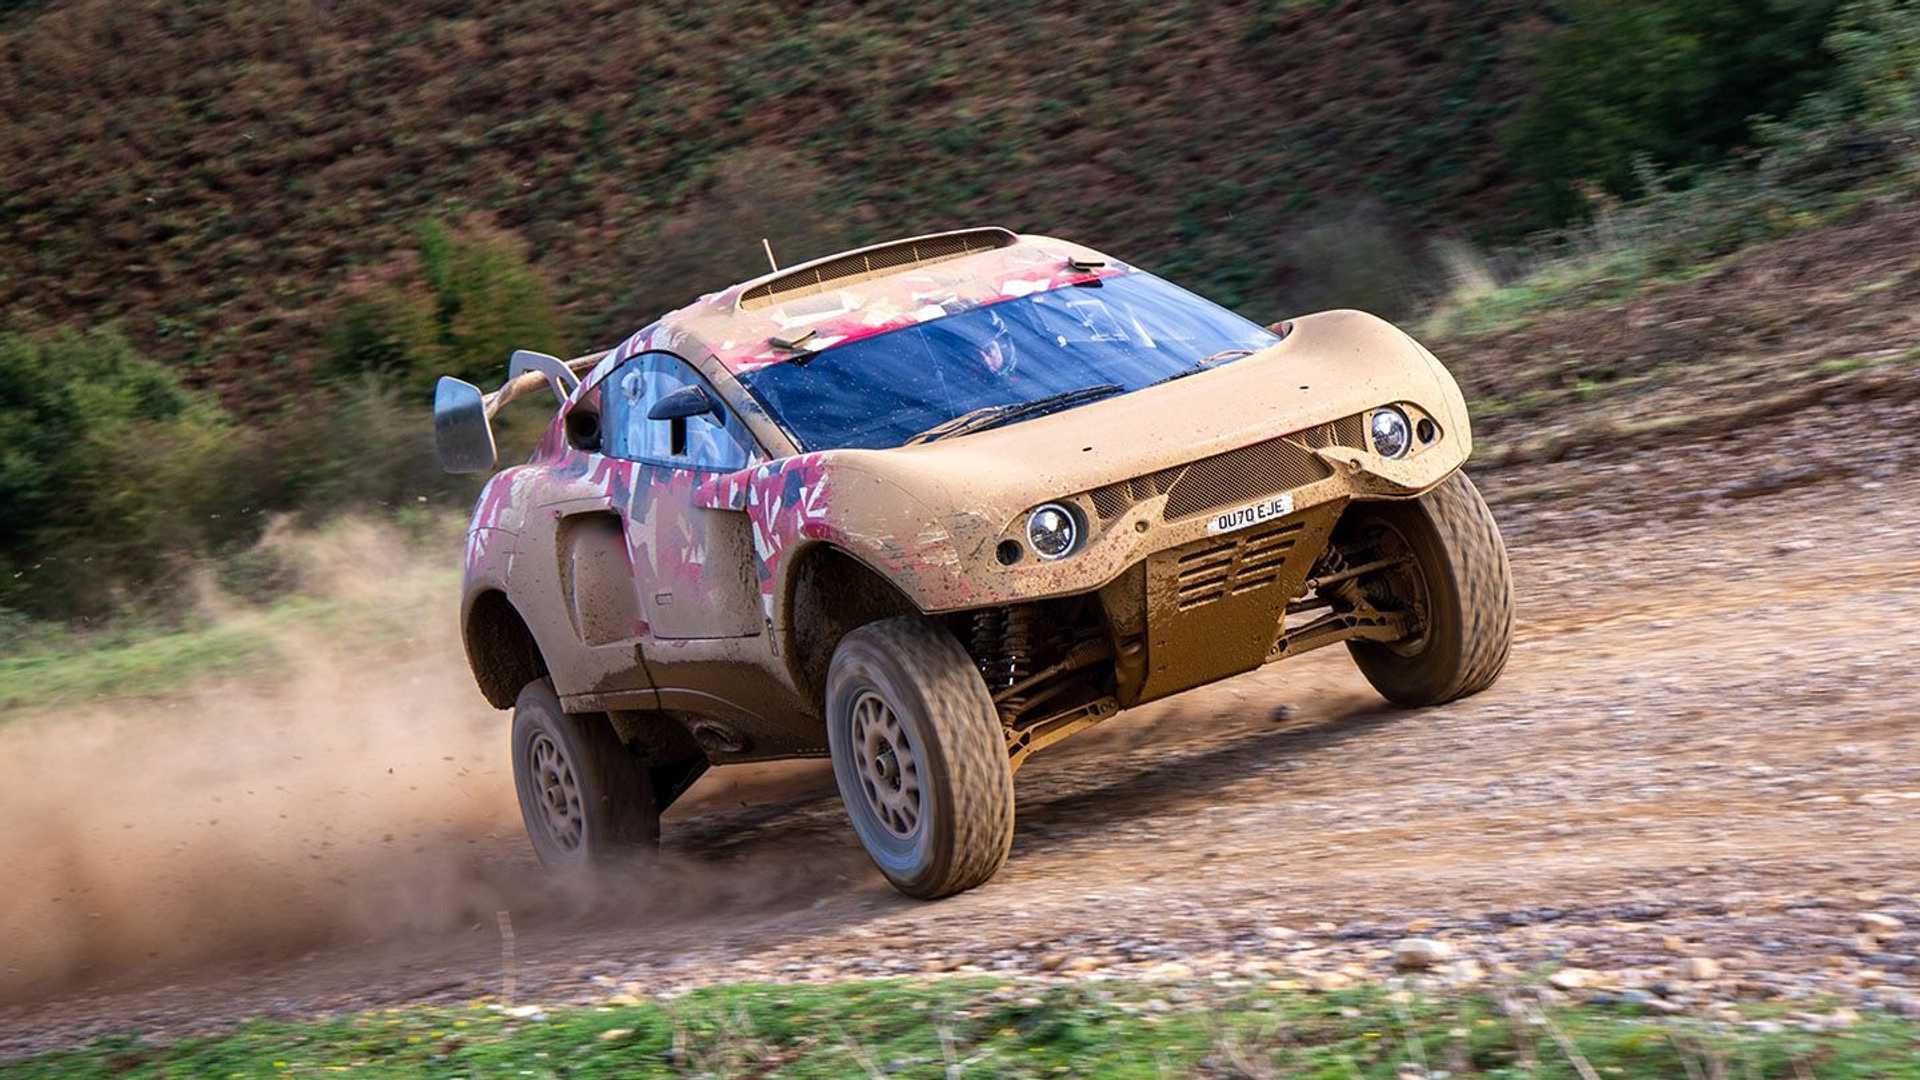 2021 BRX Hunter Dakar Rally T1 race car